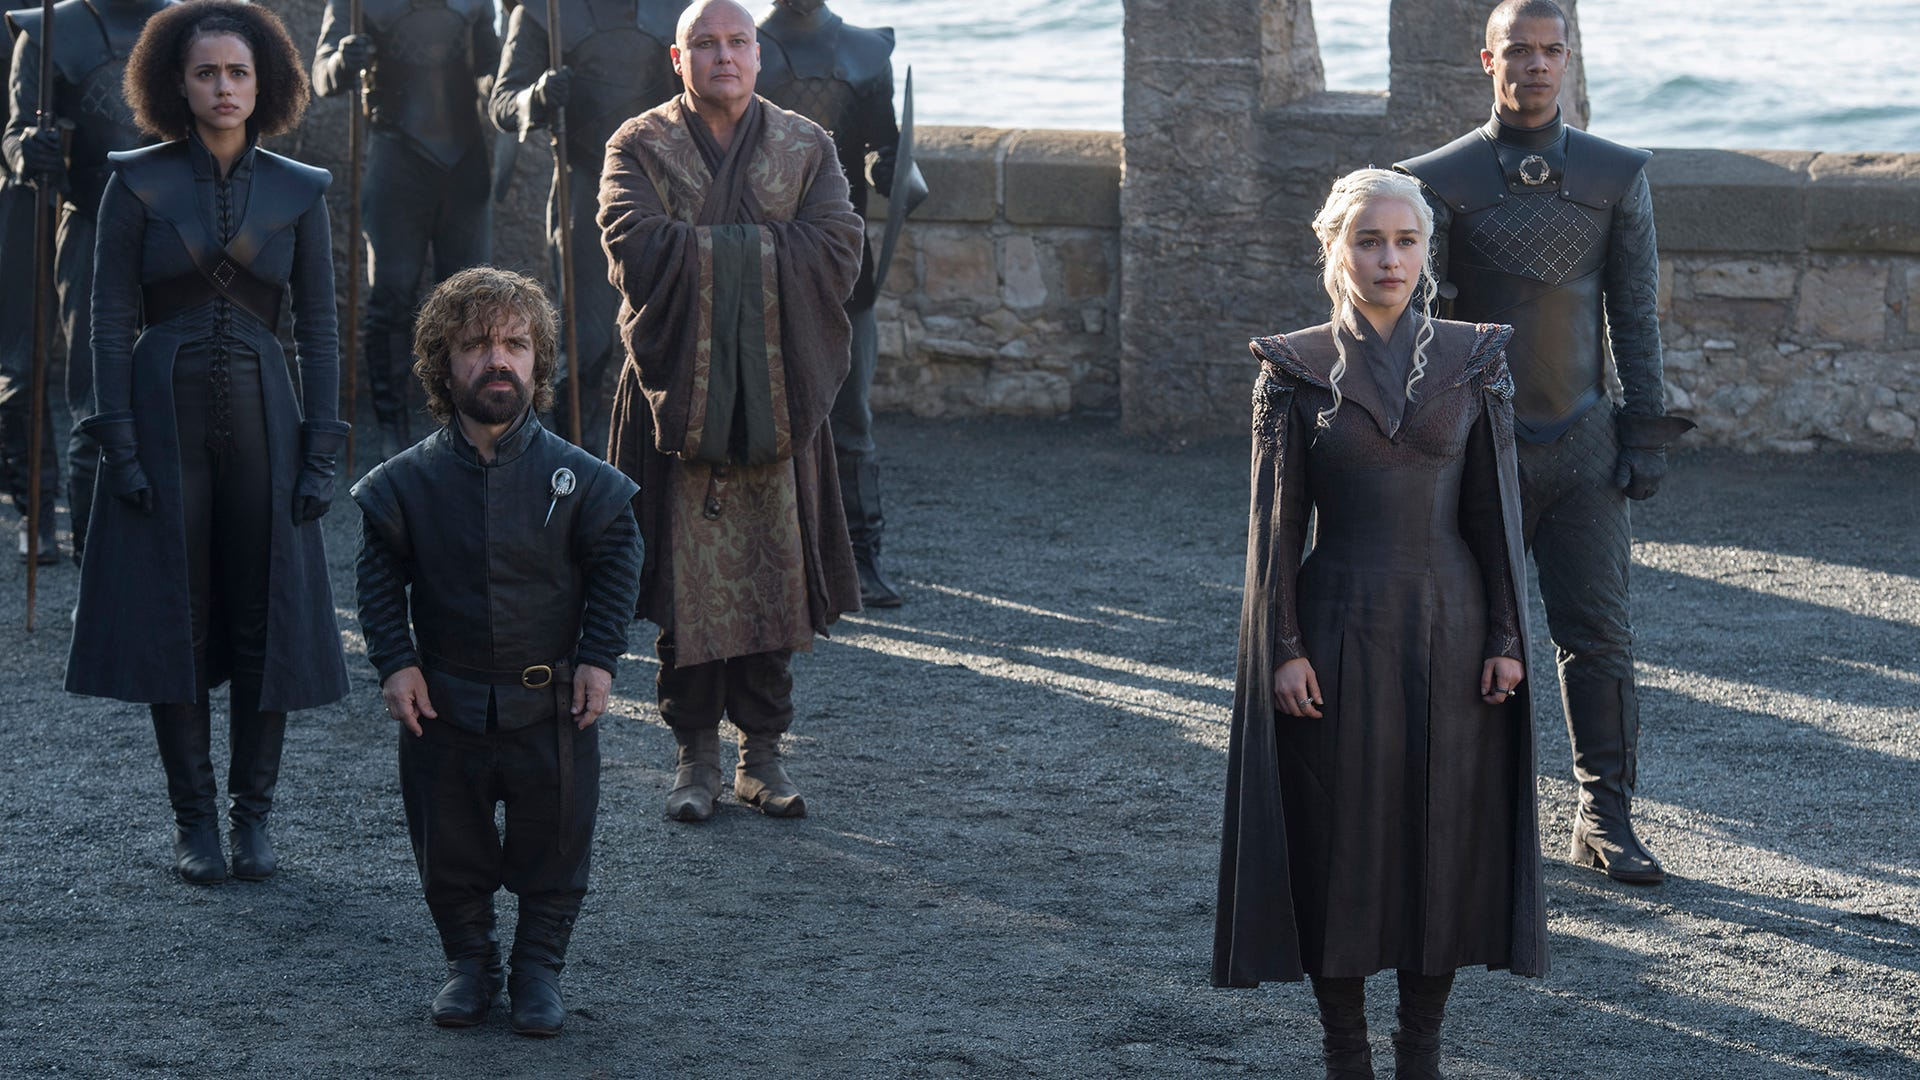 Nathalie Emmanuel, Peter Dinklage, Conleth Hill, Emilia Clarke, and Jacob Anderson; Game of Thrones